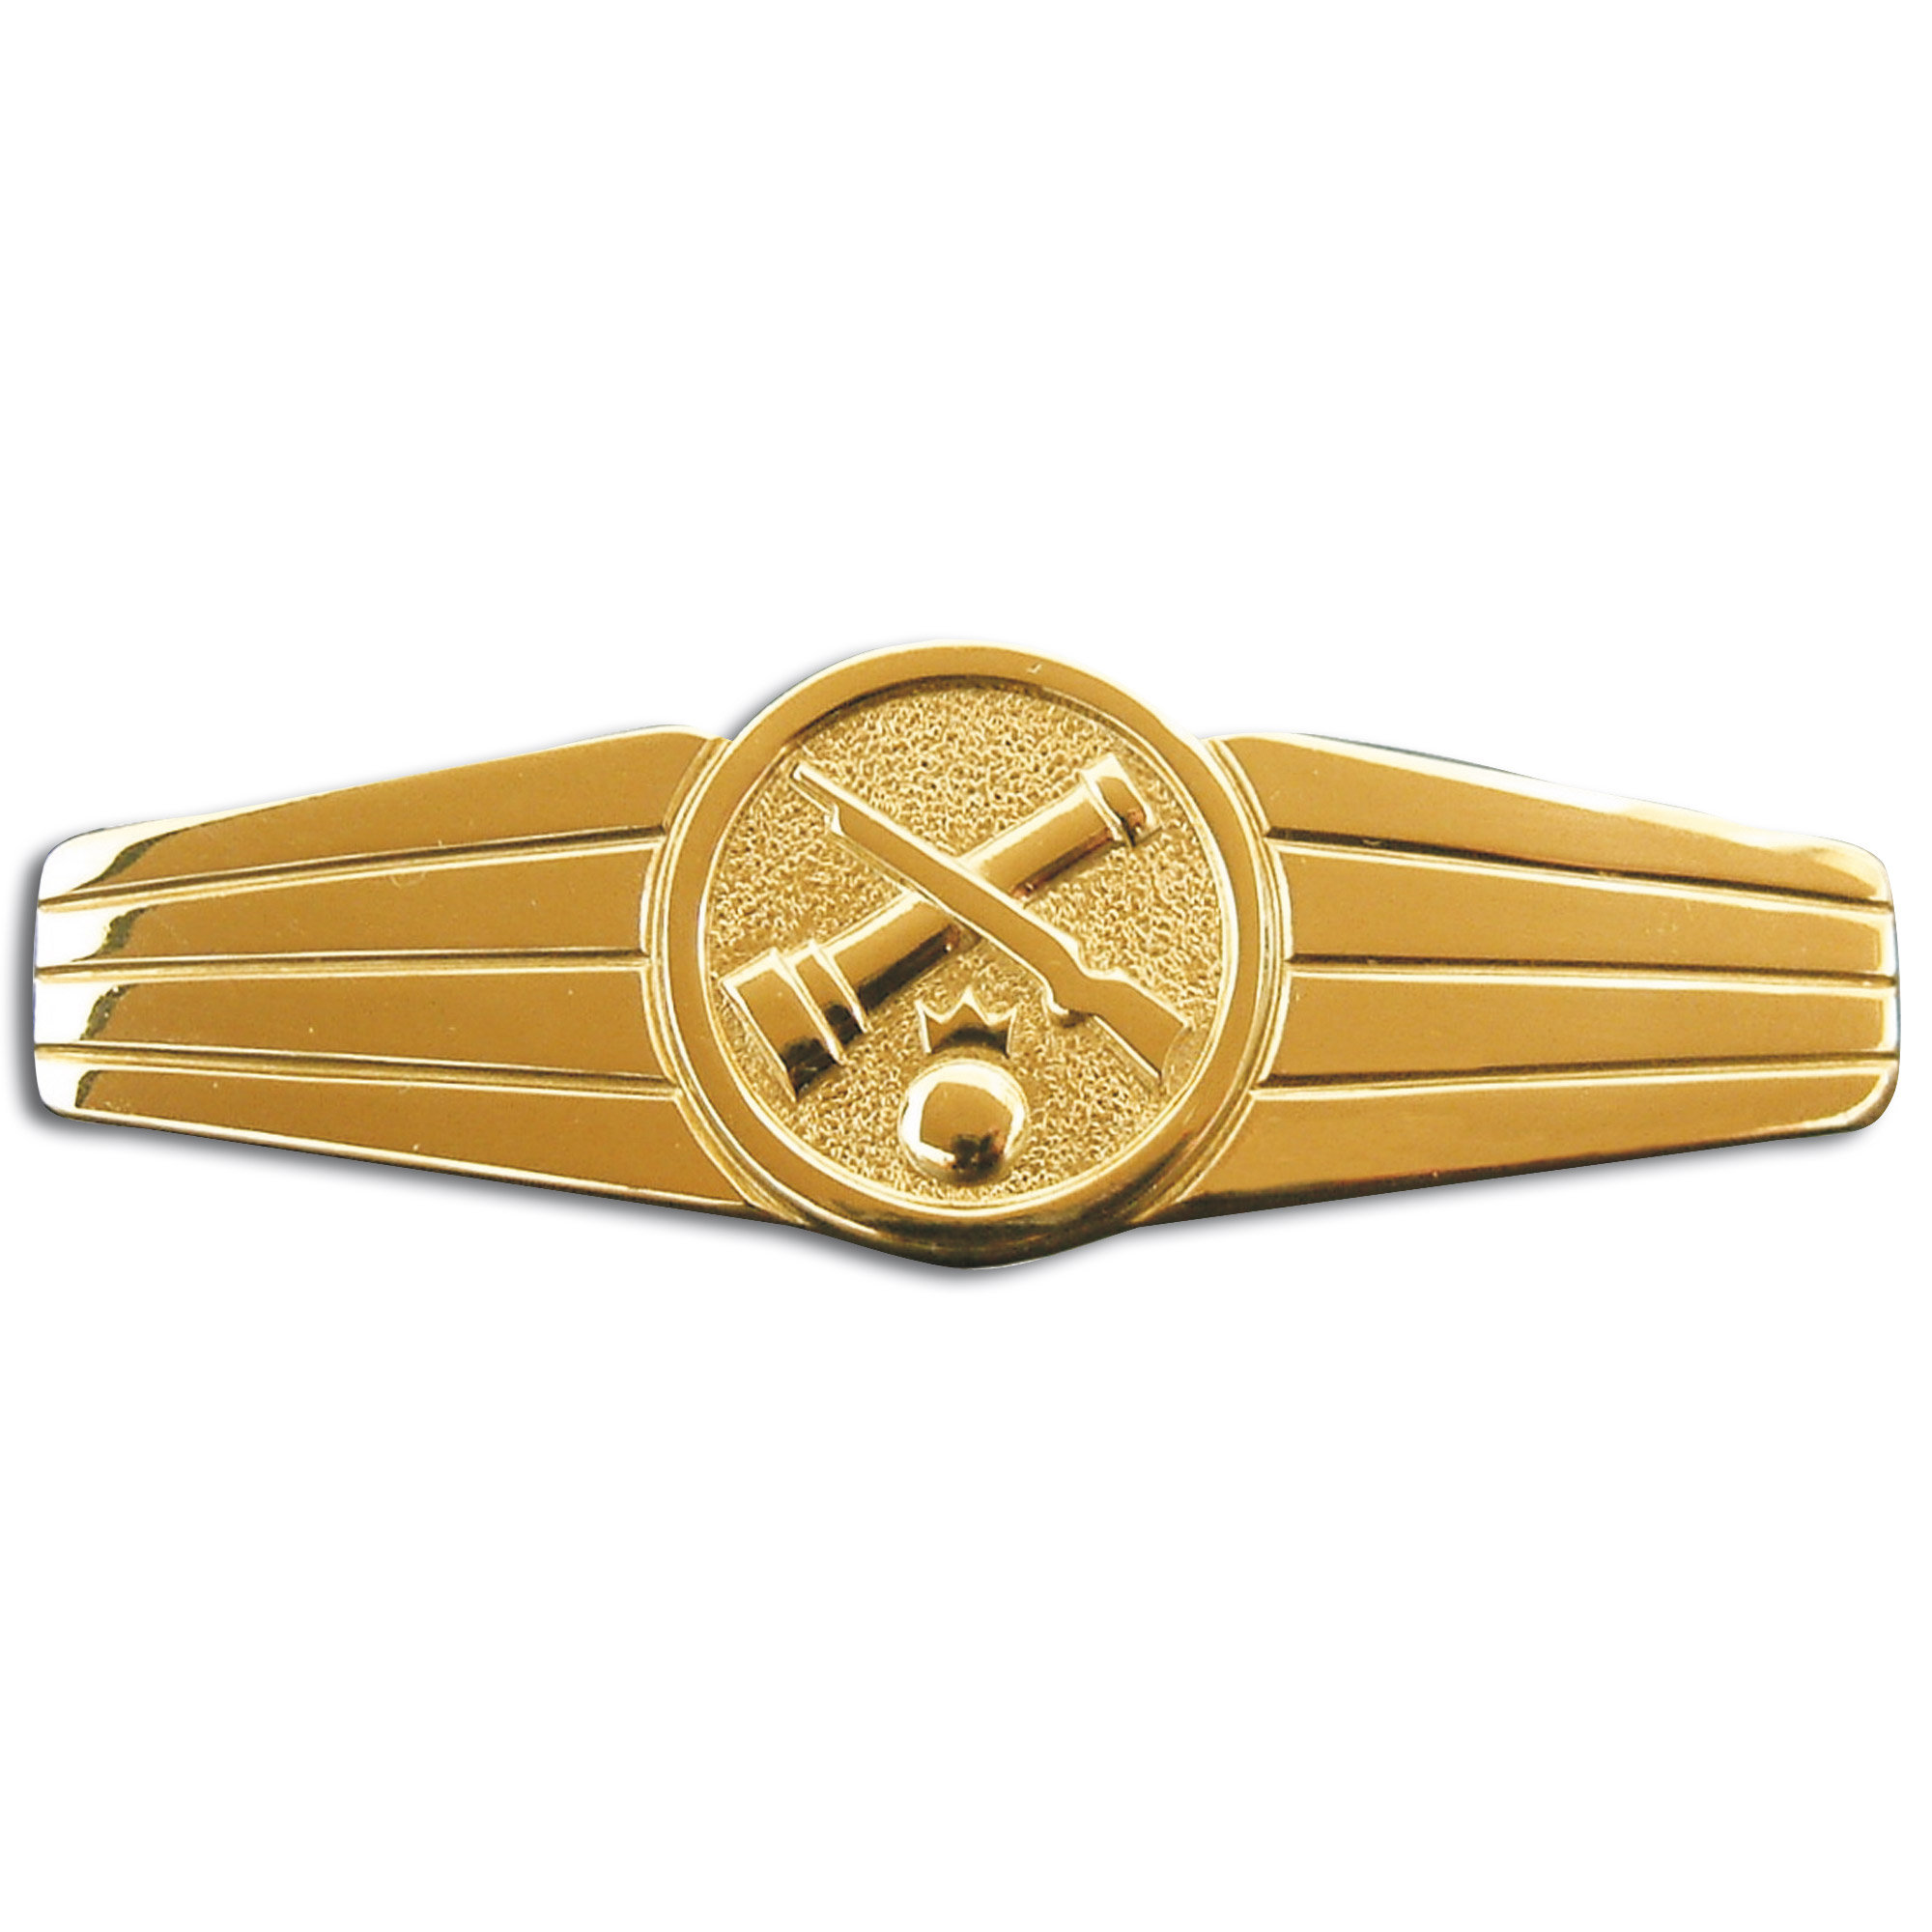 Abzeichen BW Rohrwaffenpersonal Metall gold